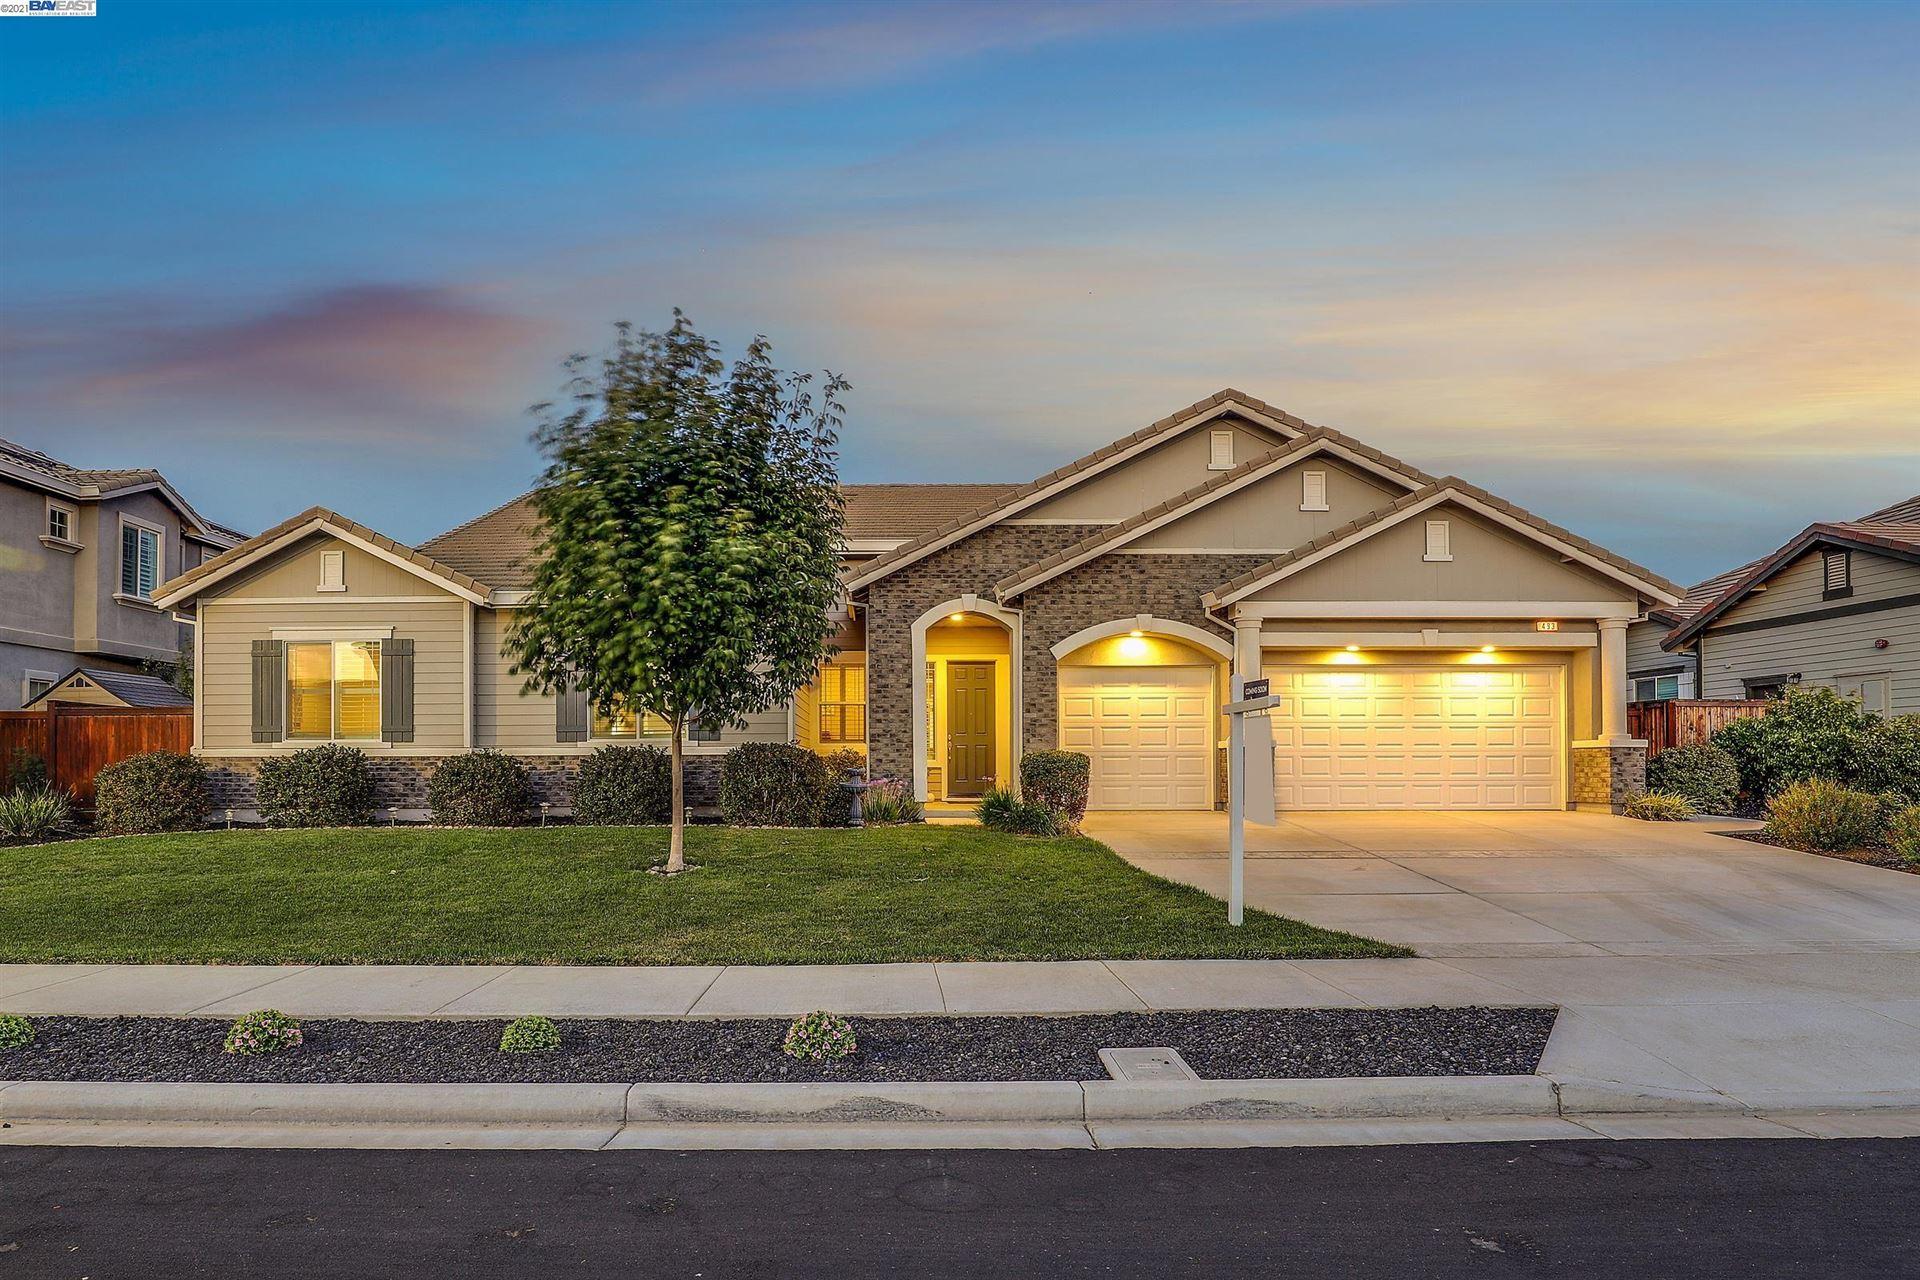 Photo of 493 Yelland Way, BRENTWOOD, CA 94513 (MLS # 40966309)